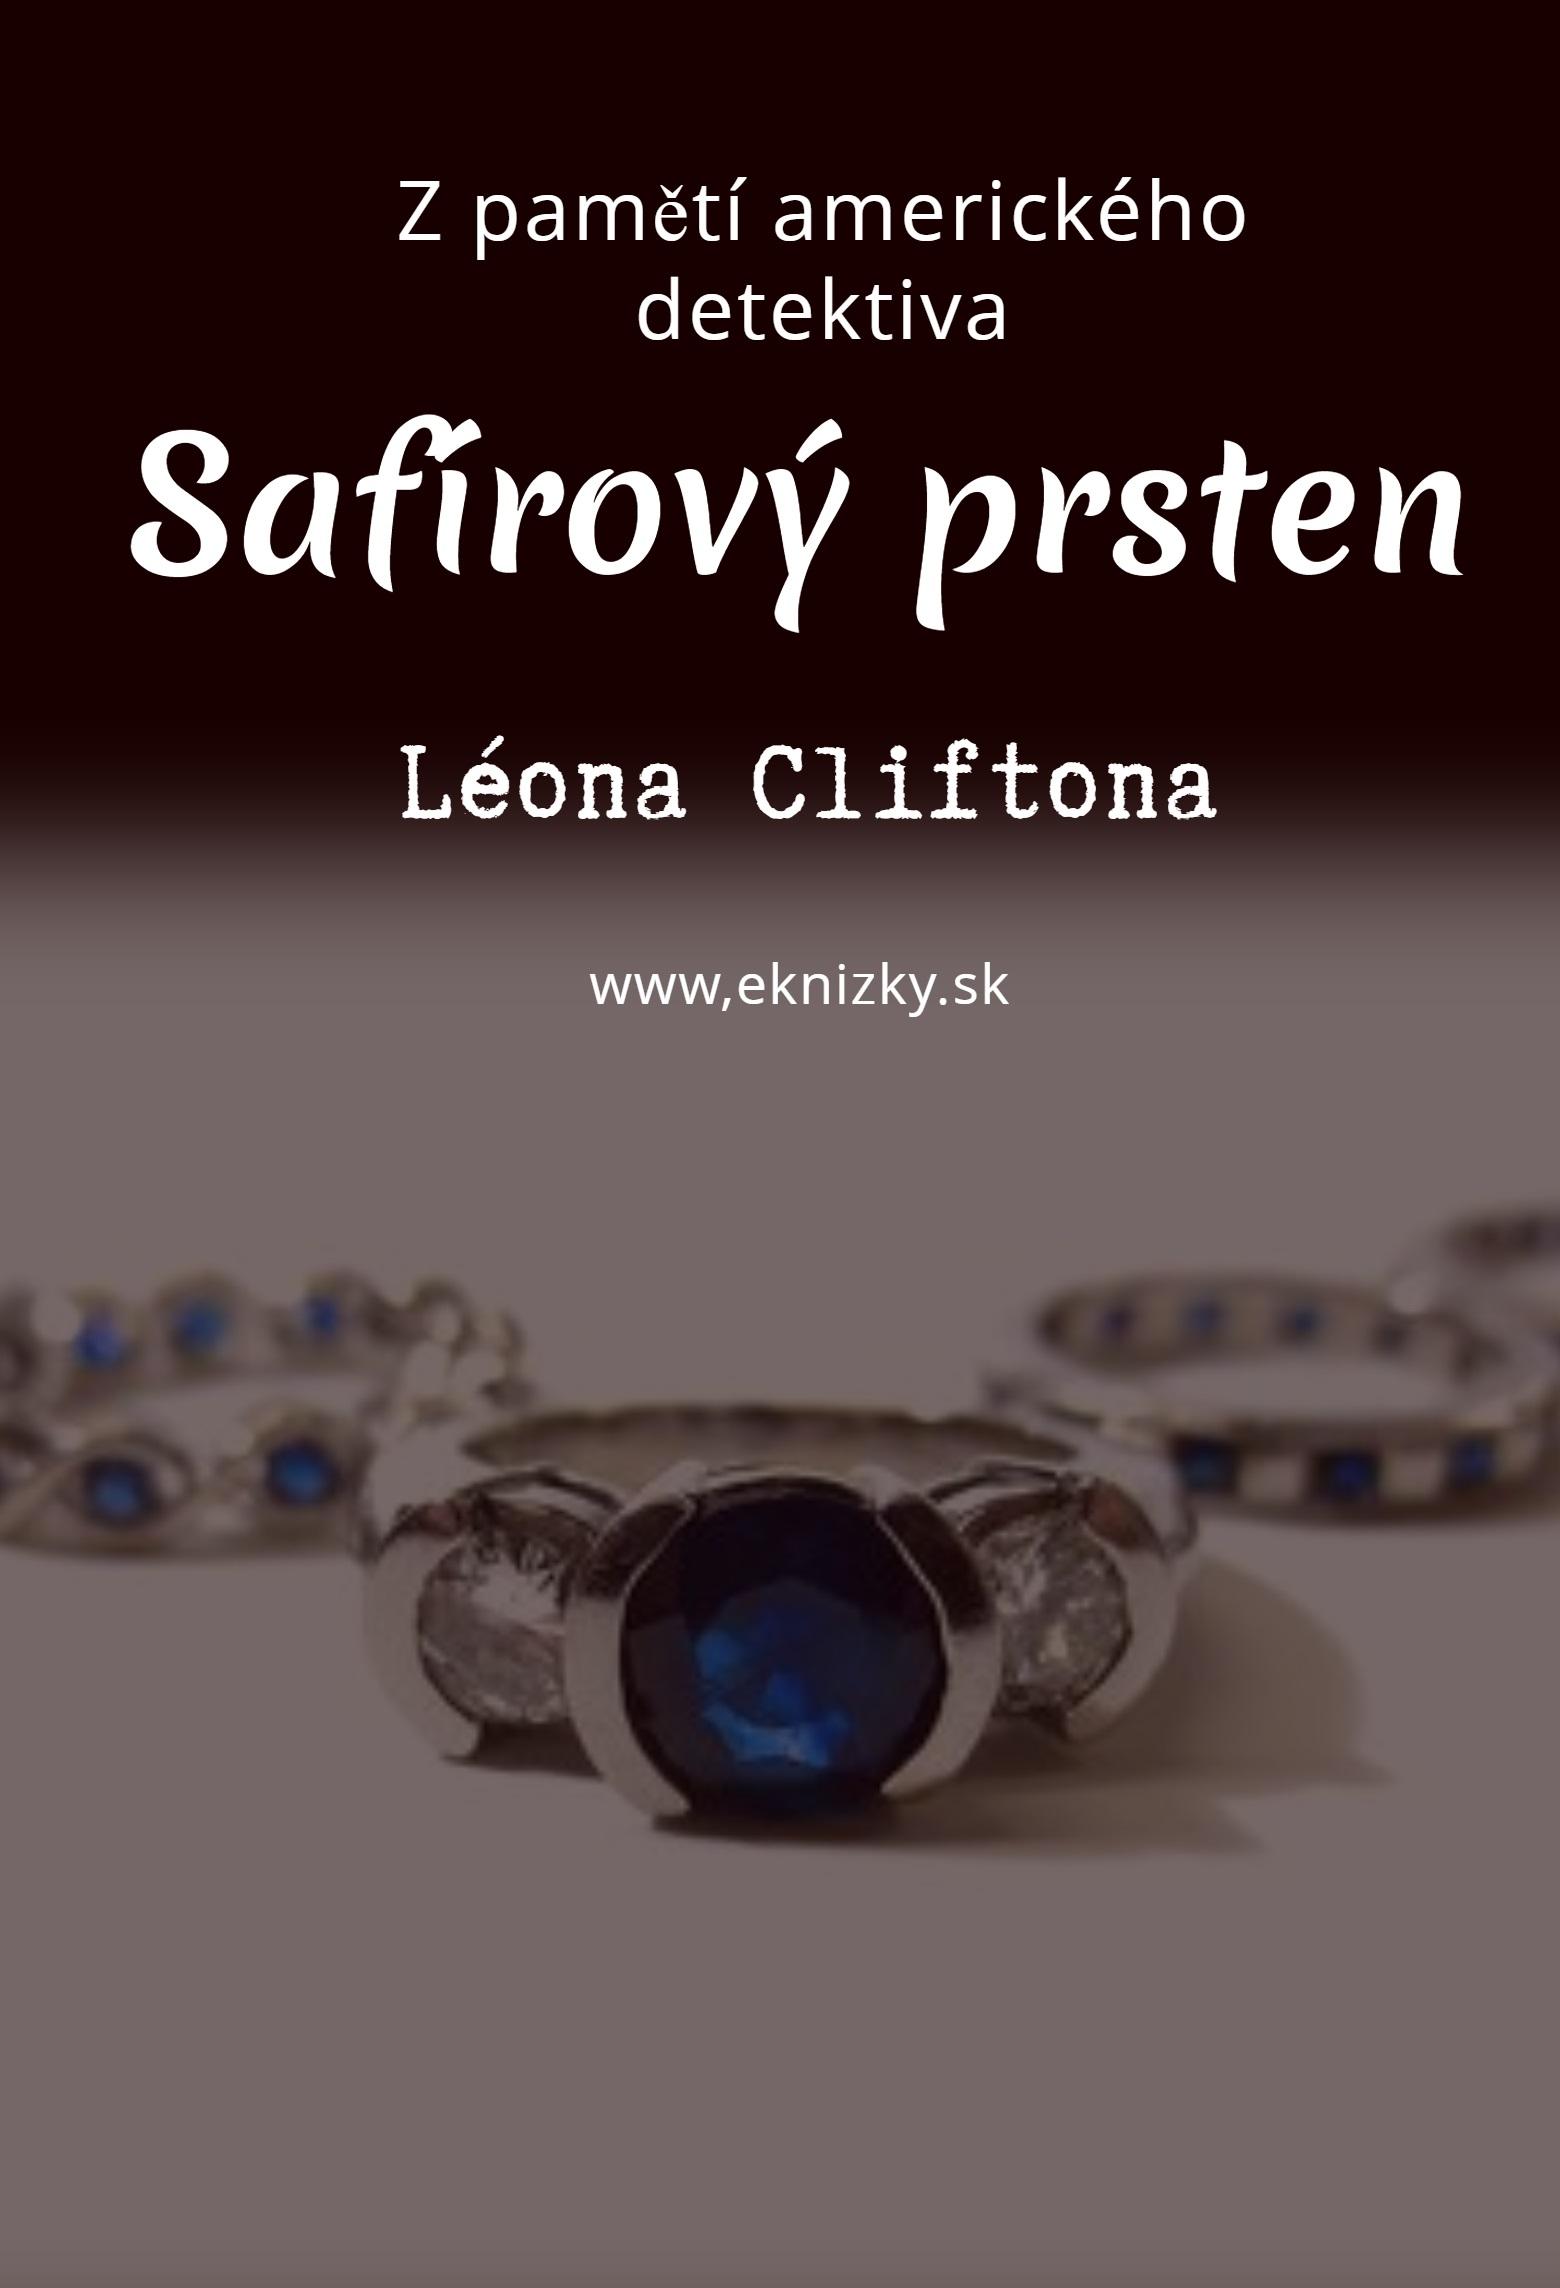 safirovy prsten